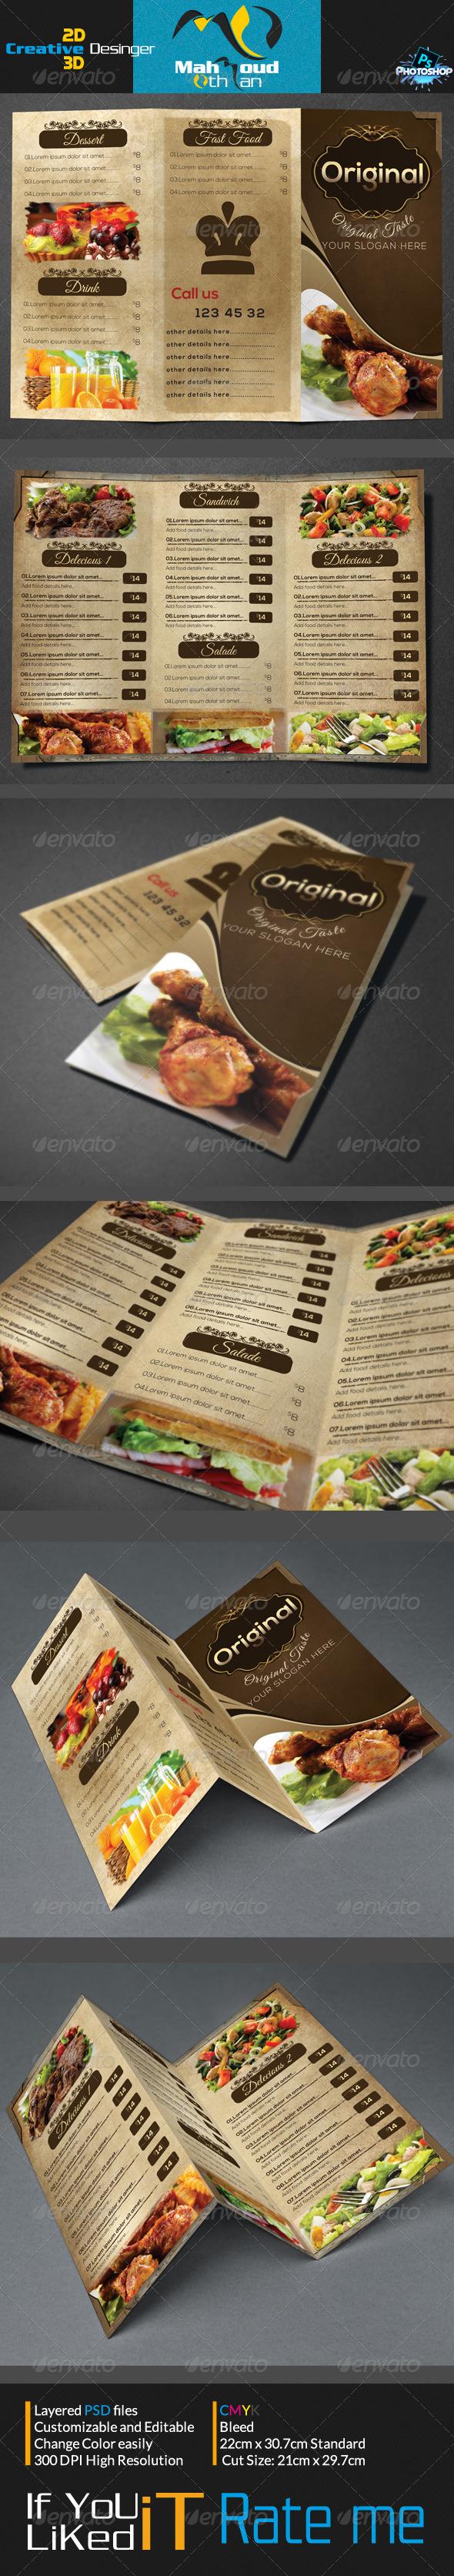 Vintage Trifold Restaurant Menu